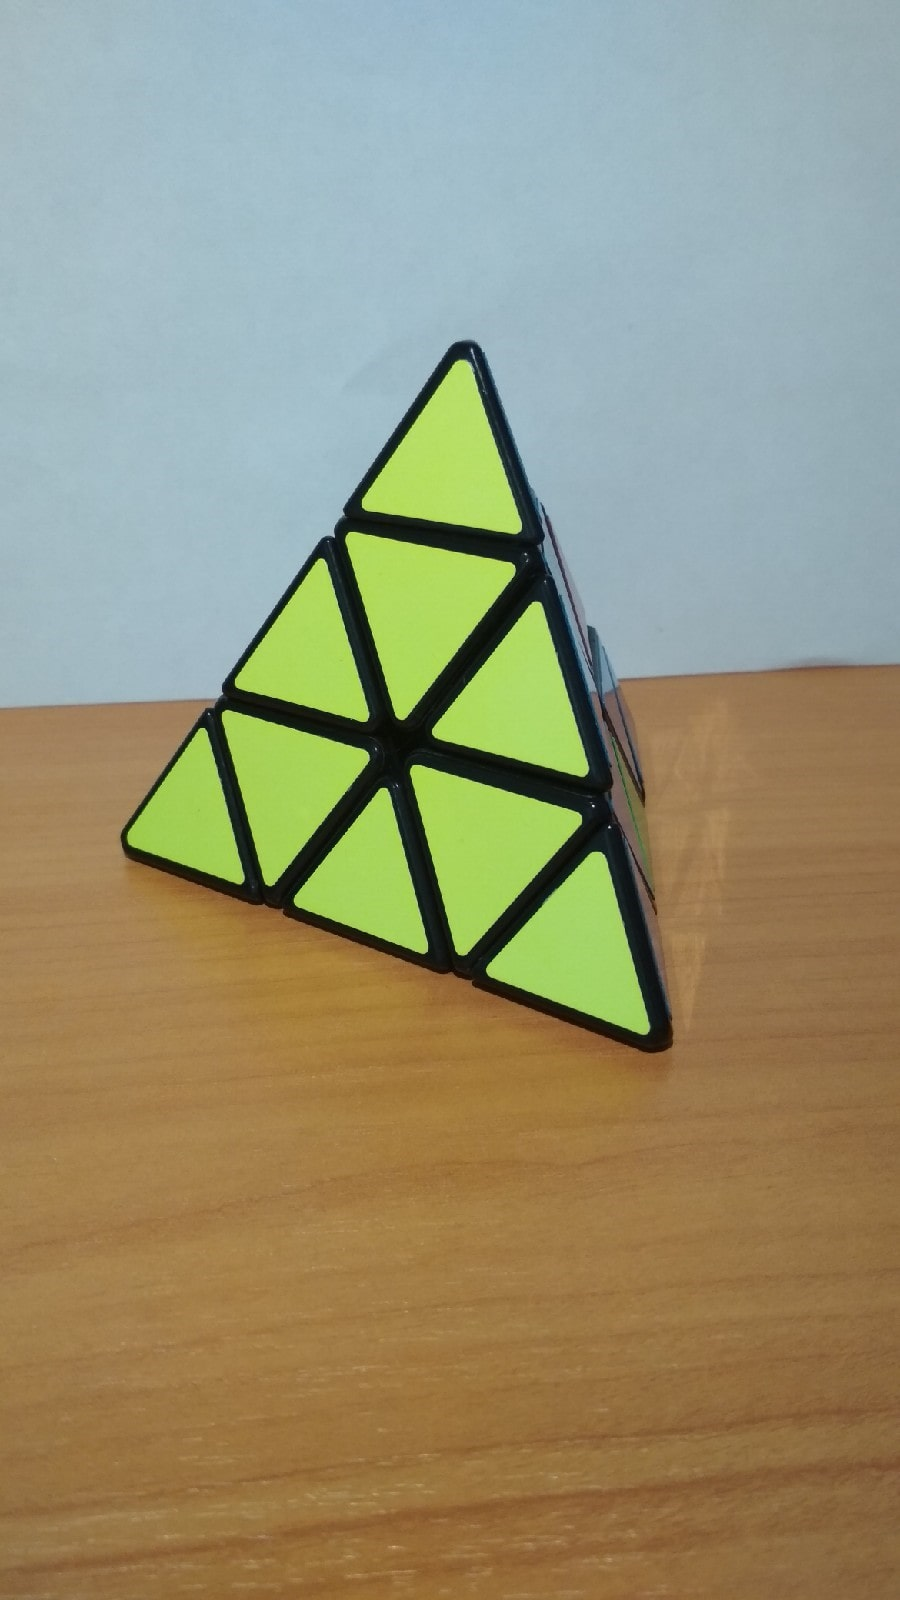 Итоговый вариант кубика Рубика пирамидки